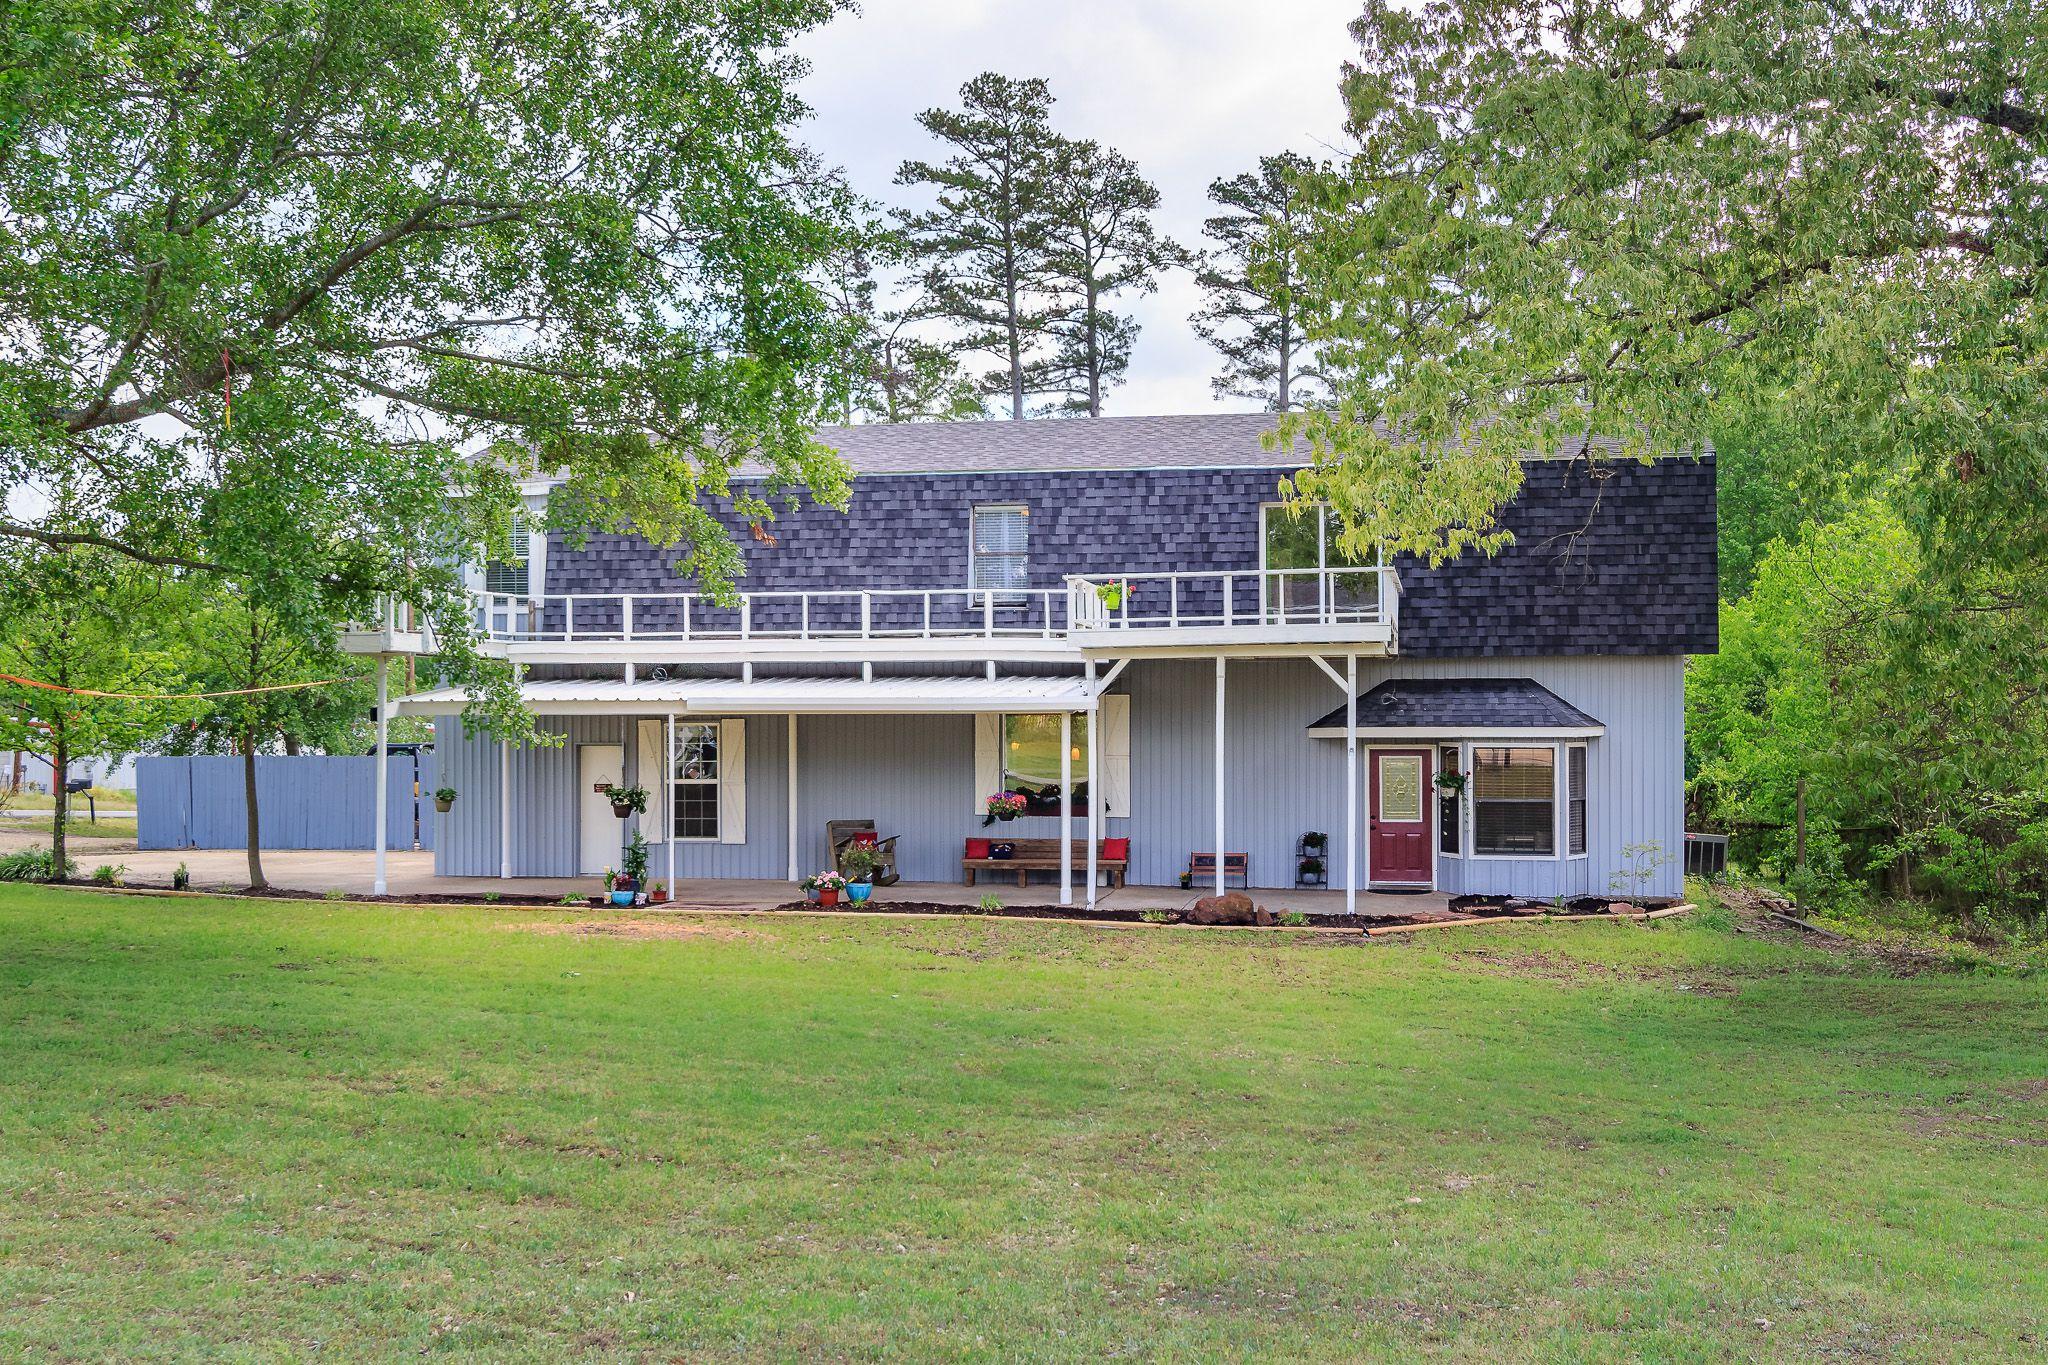 781 W Wilkins Rd, Gladewater, TX 75647 - 3 Bed, 3 Bath Single-Family Home -  27 Photos   Trulia